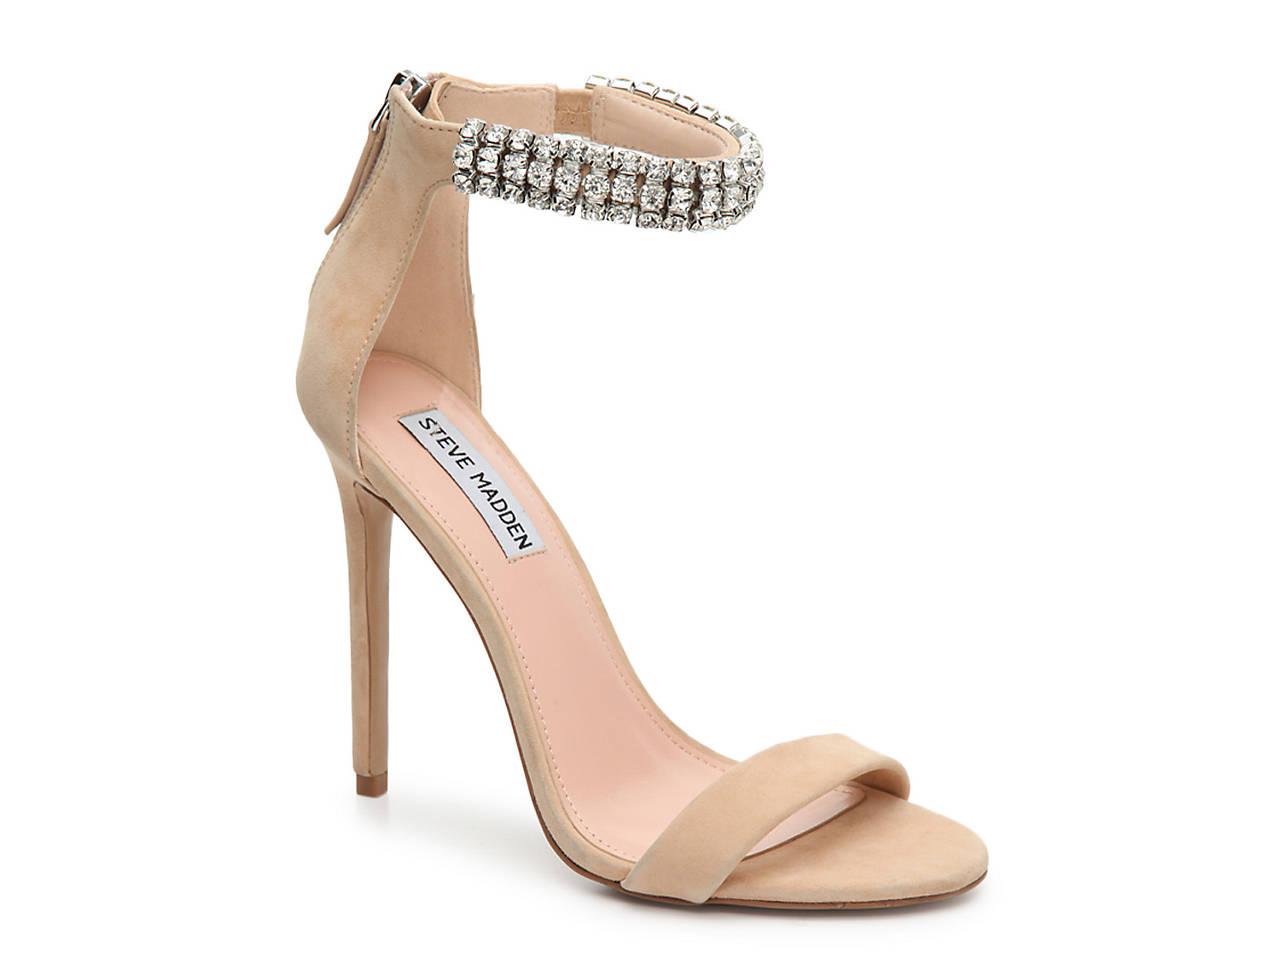 5a42cbf3b8b2 Steve Madden Rando Sandal Women s Shoes